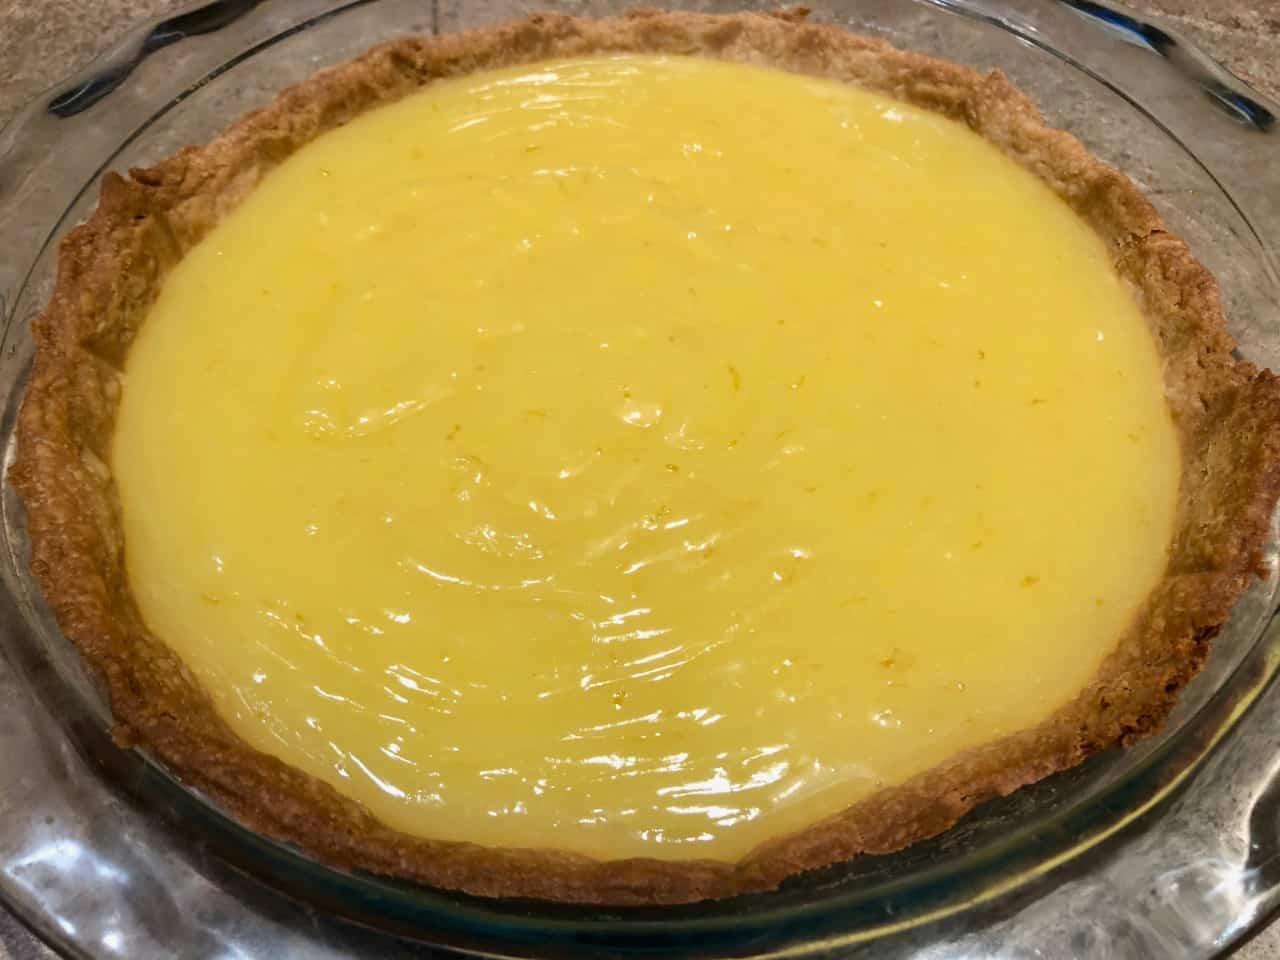 meyer lemon pudding in baked pie crust